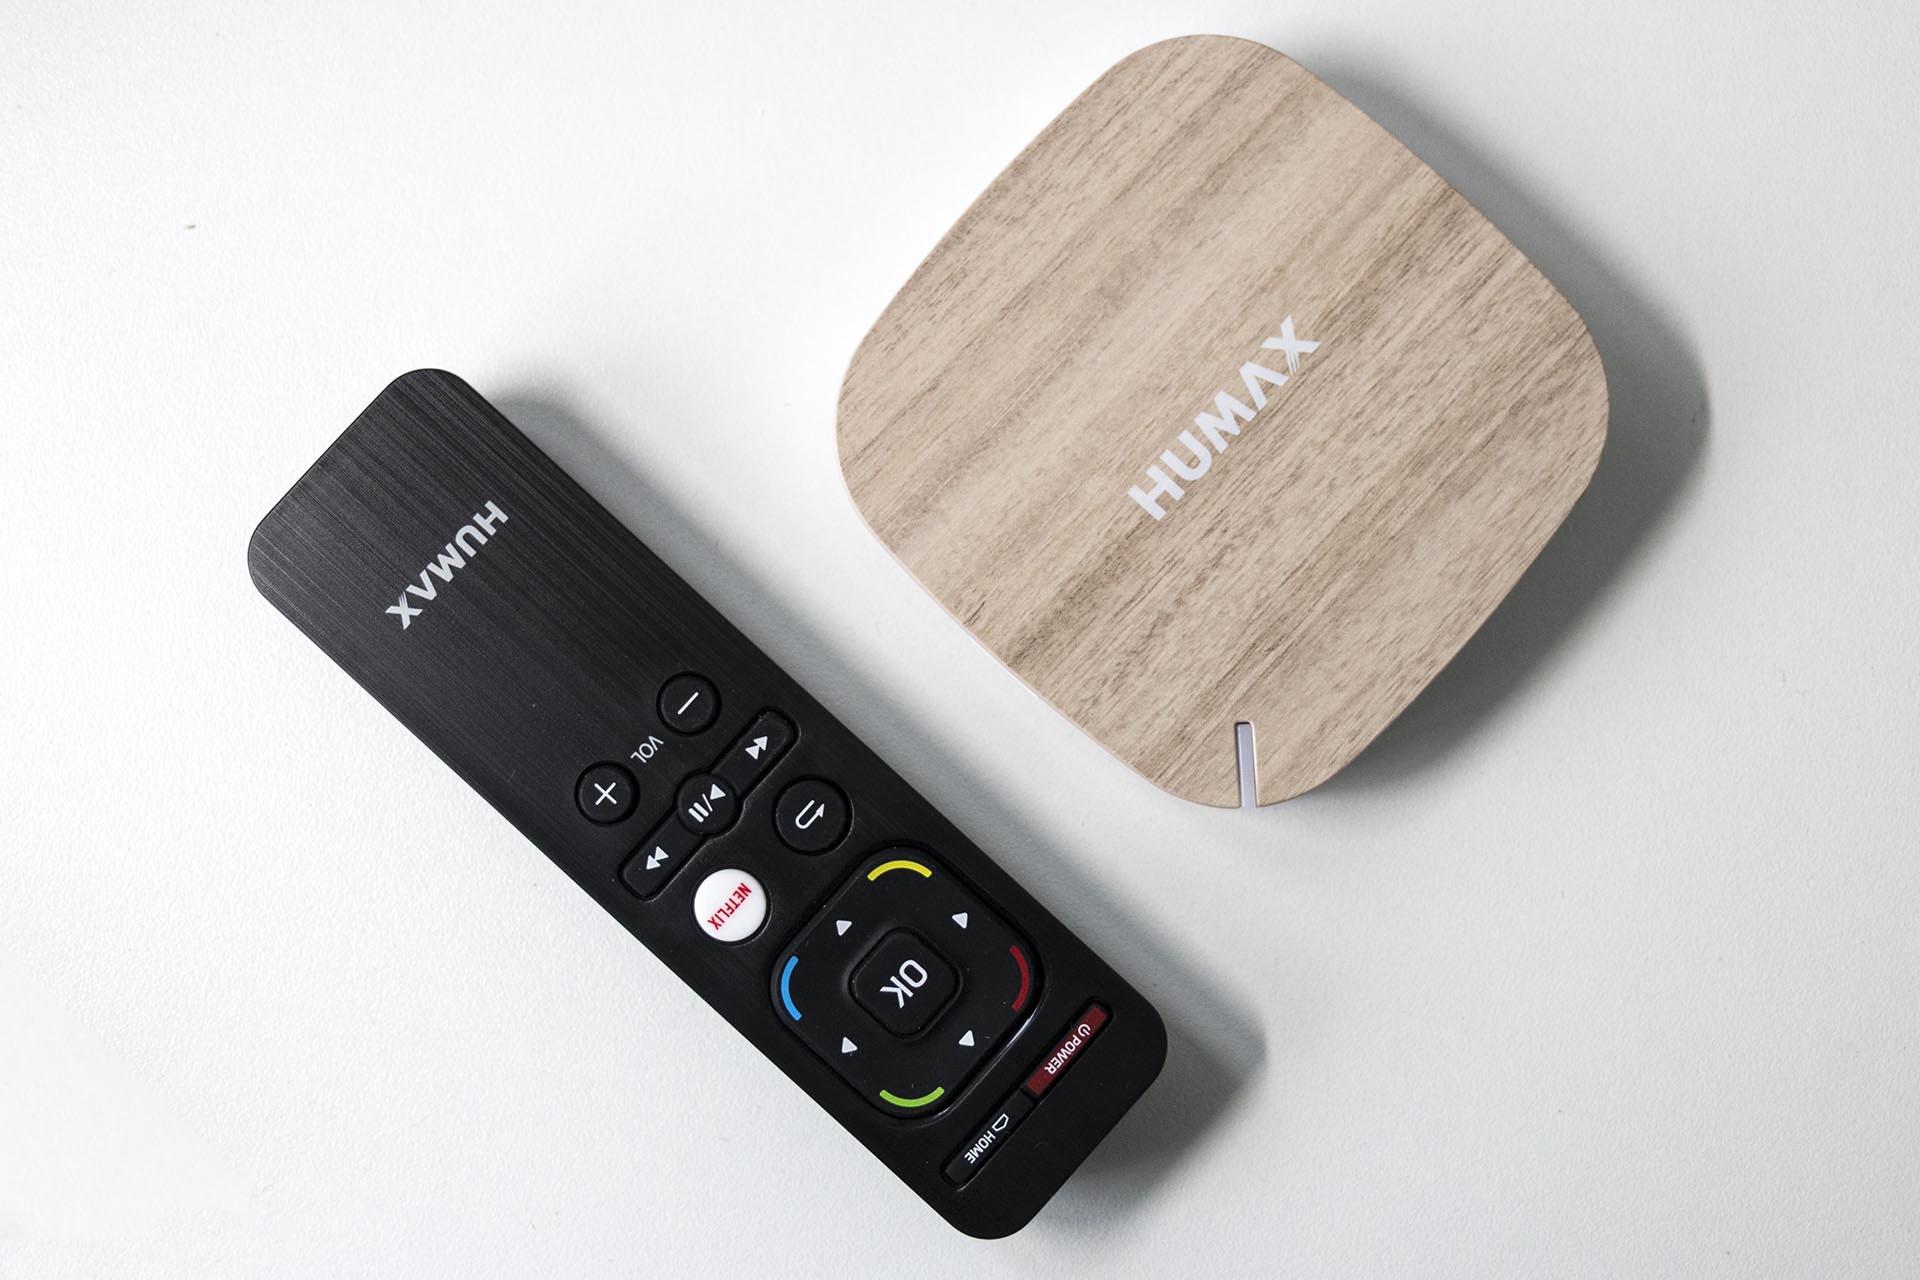 Humax TV+